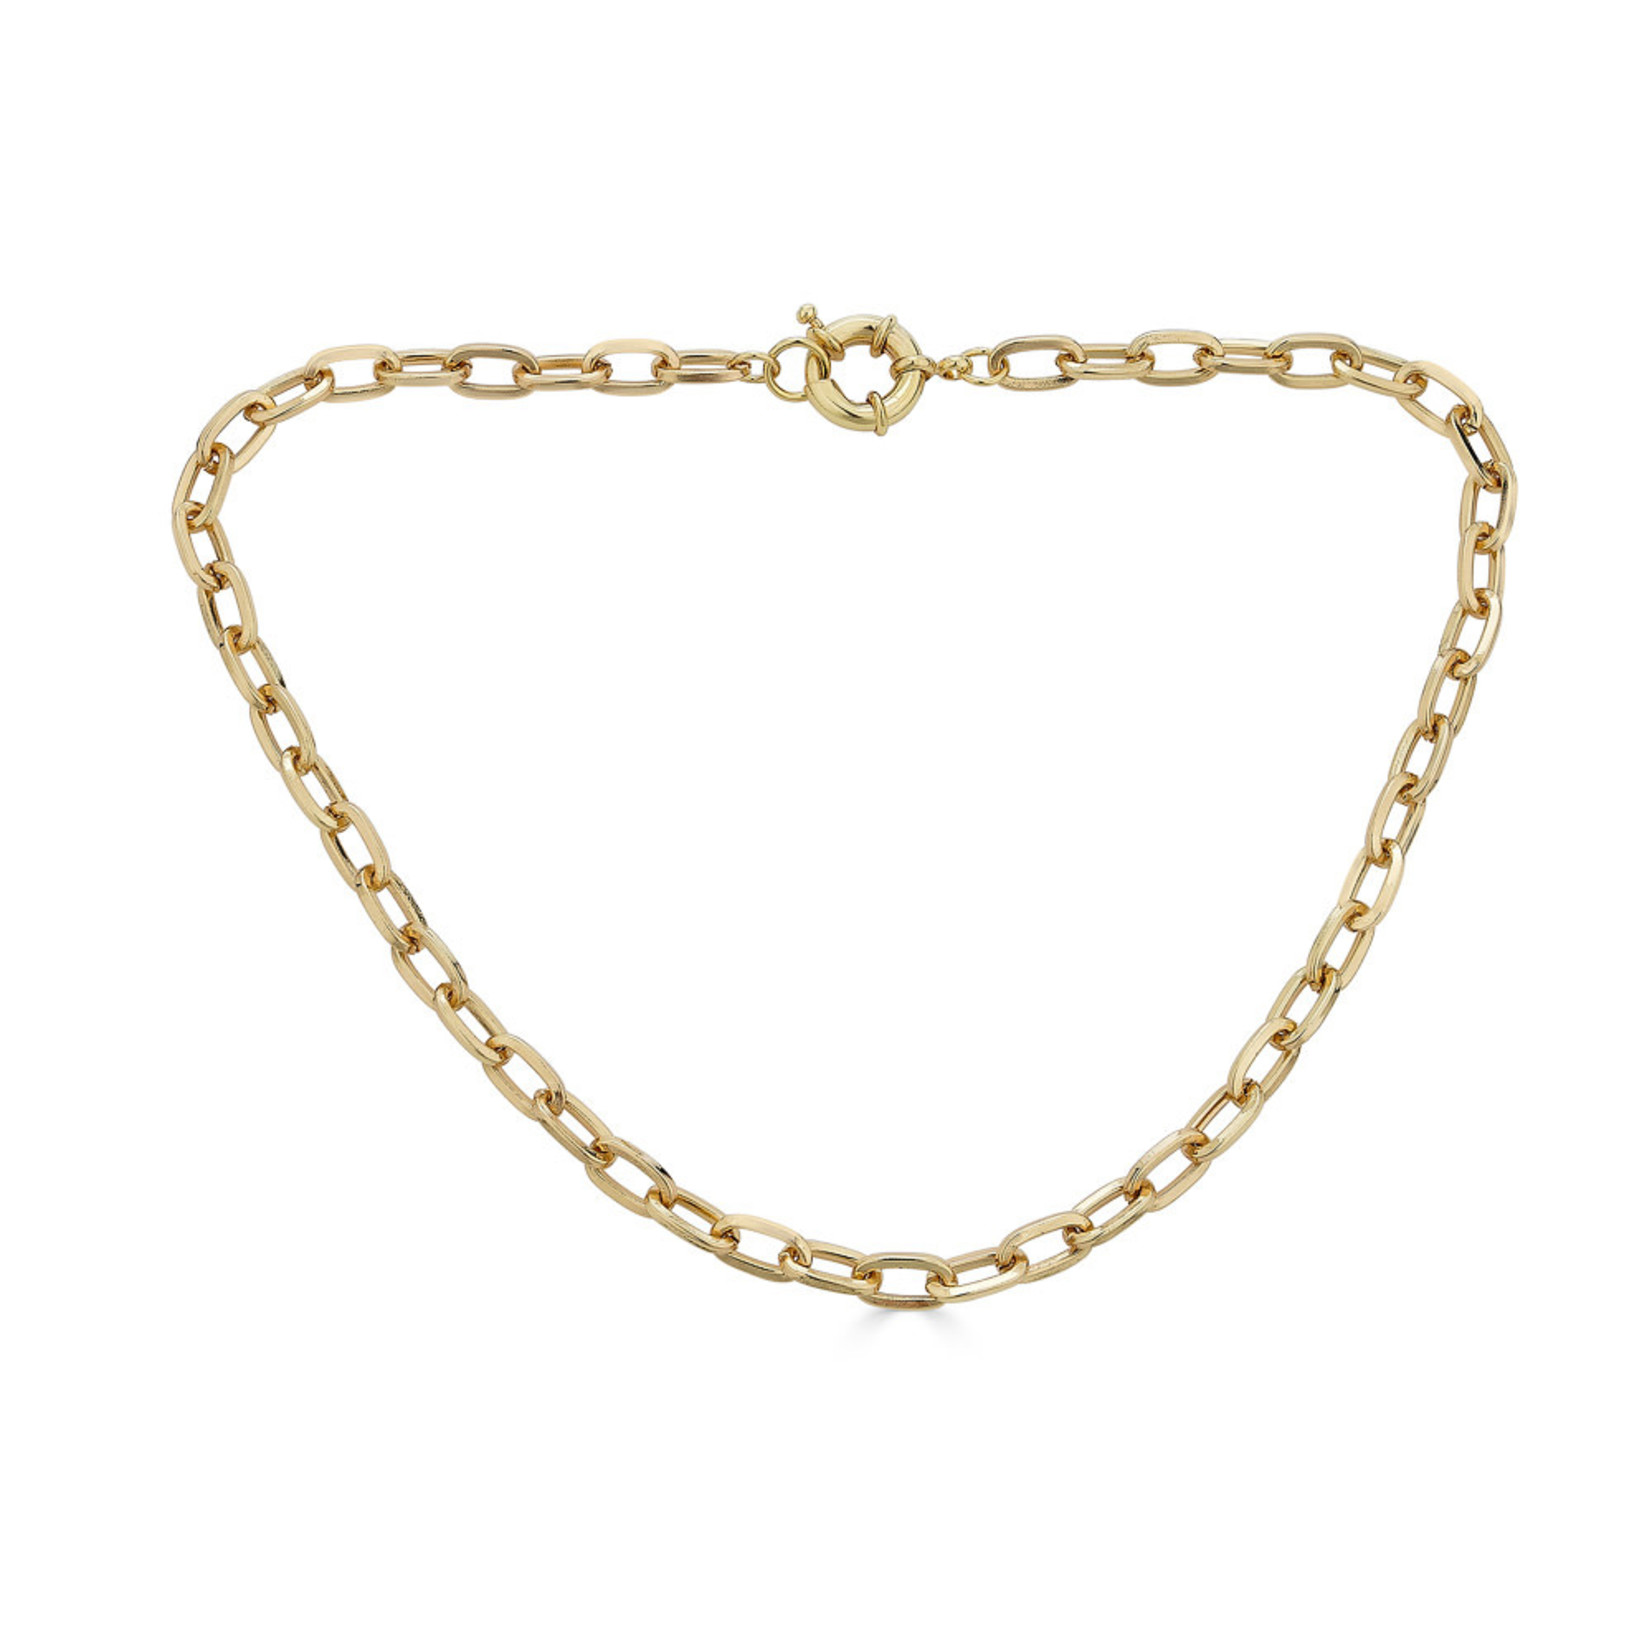 Rendor Khris Thick Link Necklace